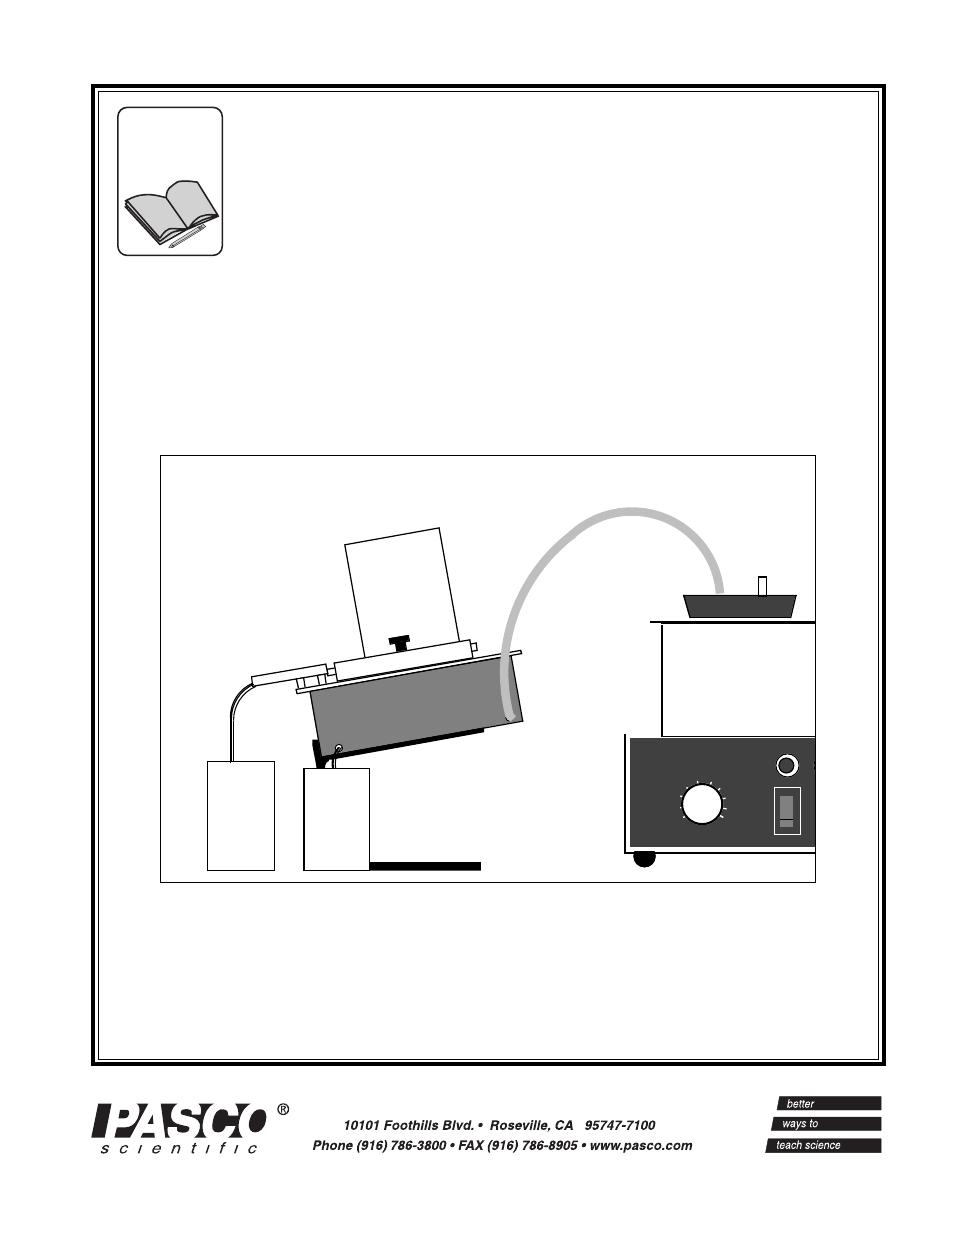 PASCO TD-8561 THERMAL CONDUCTIVITY APPARATUS User Manual